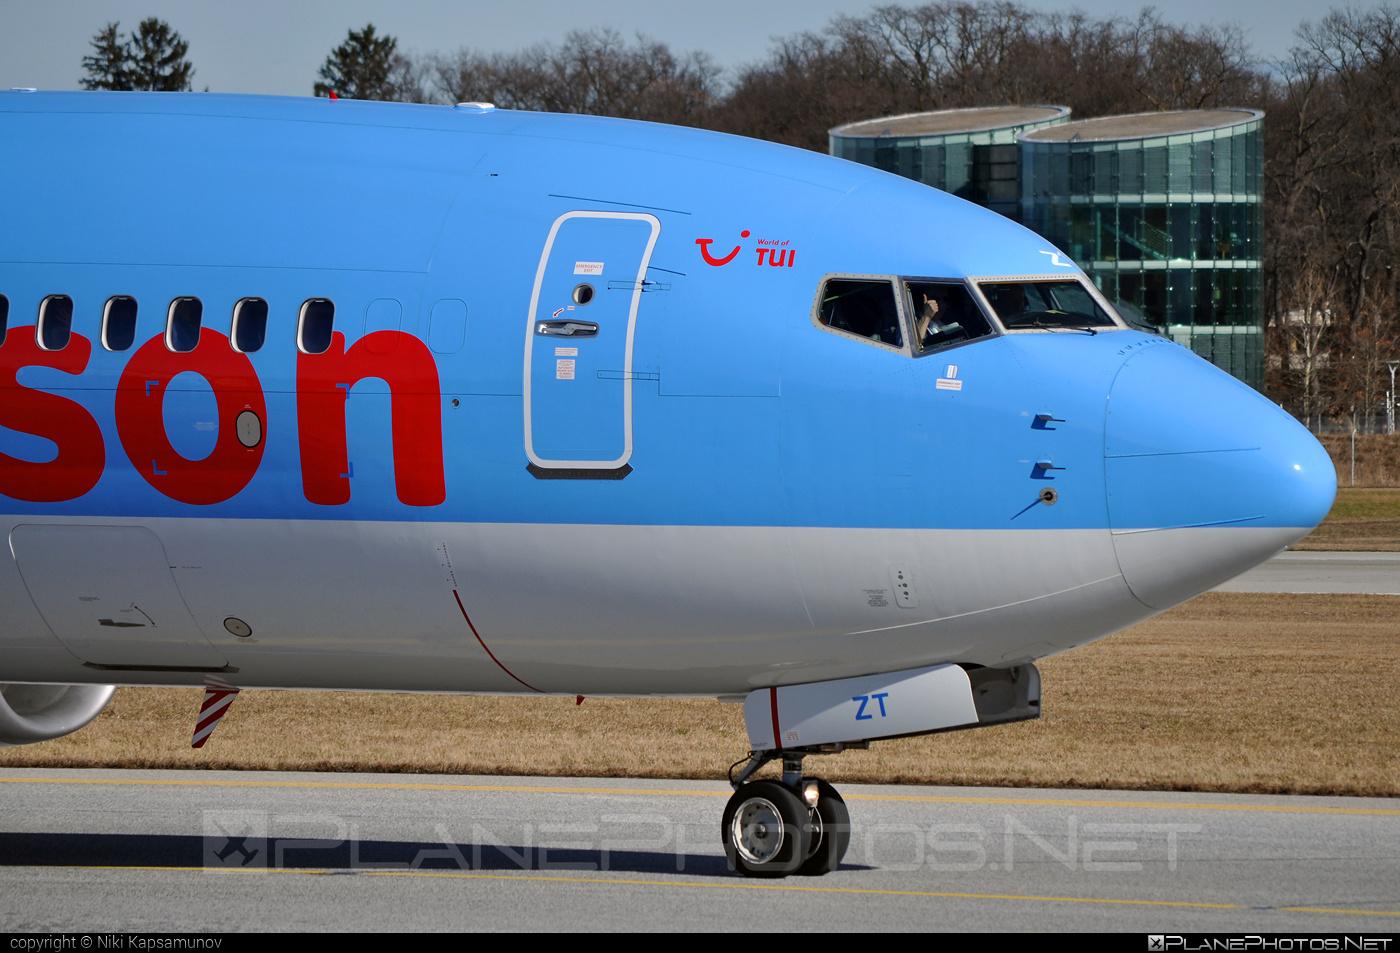 Boeing 737-800 - G-FDZT operated by Thomson Airways #b737 #b737nextgen #b737ng #boeing #boeing737